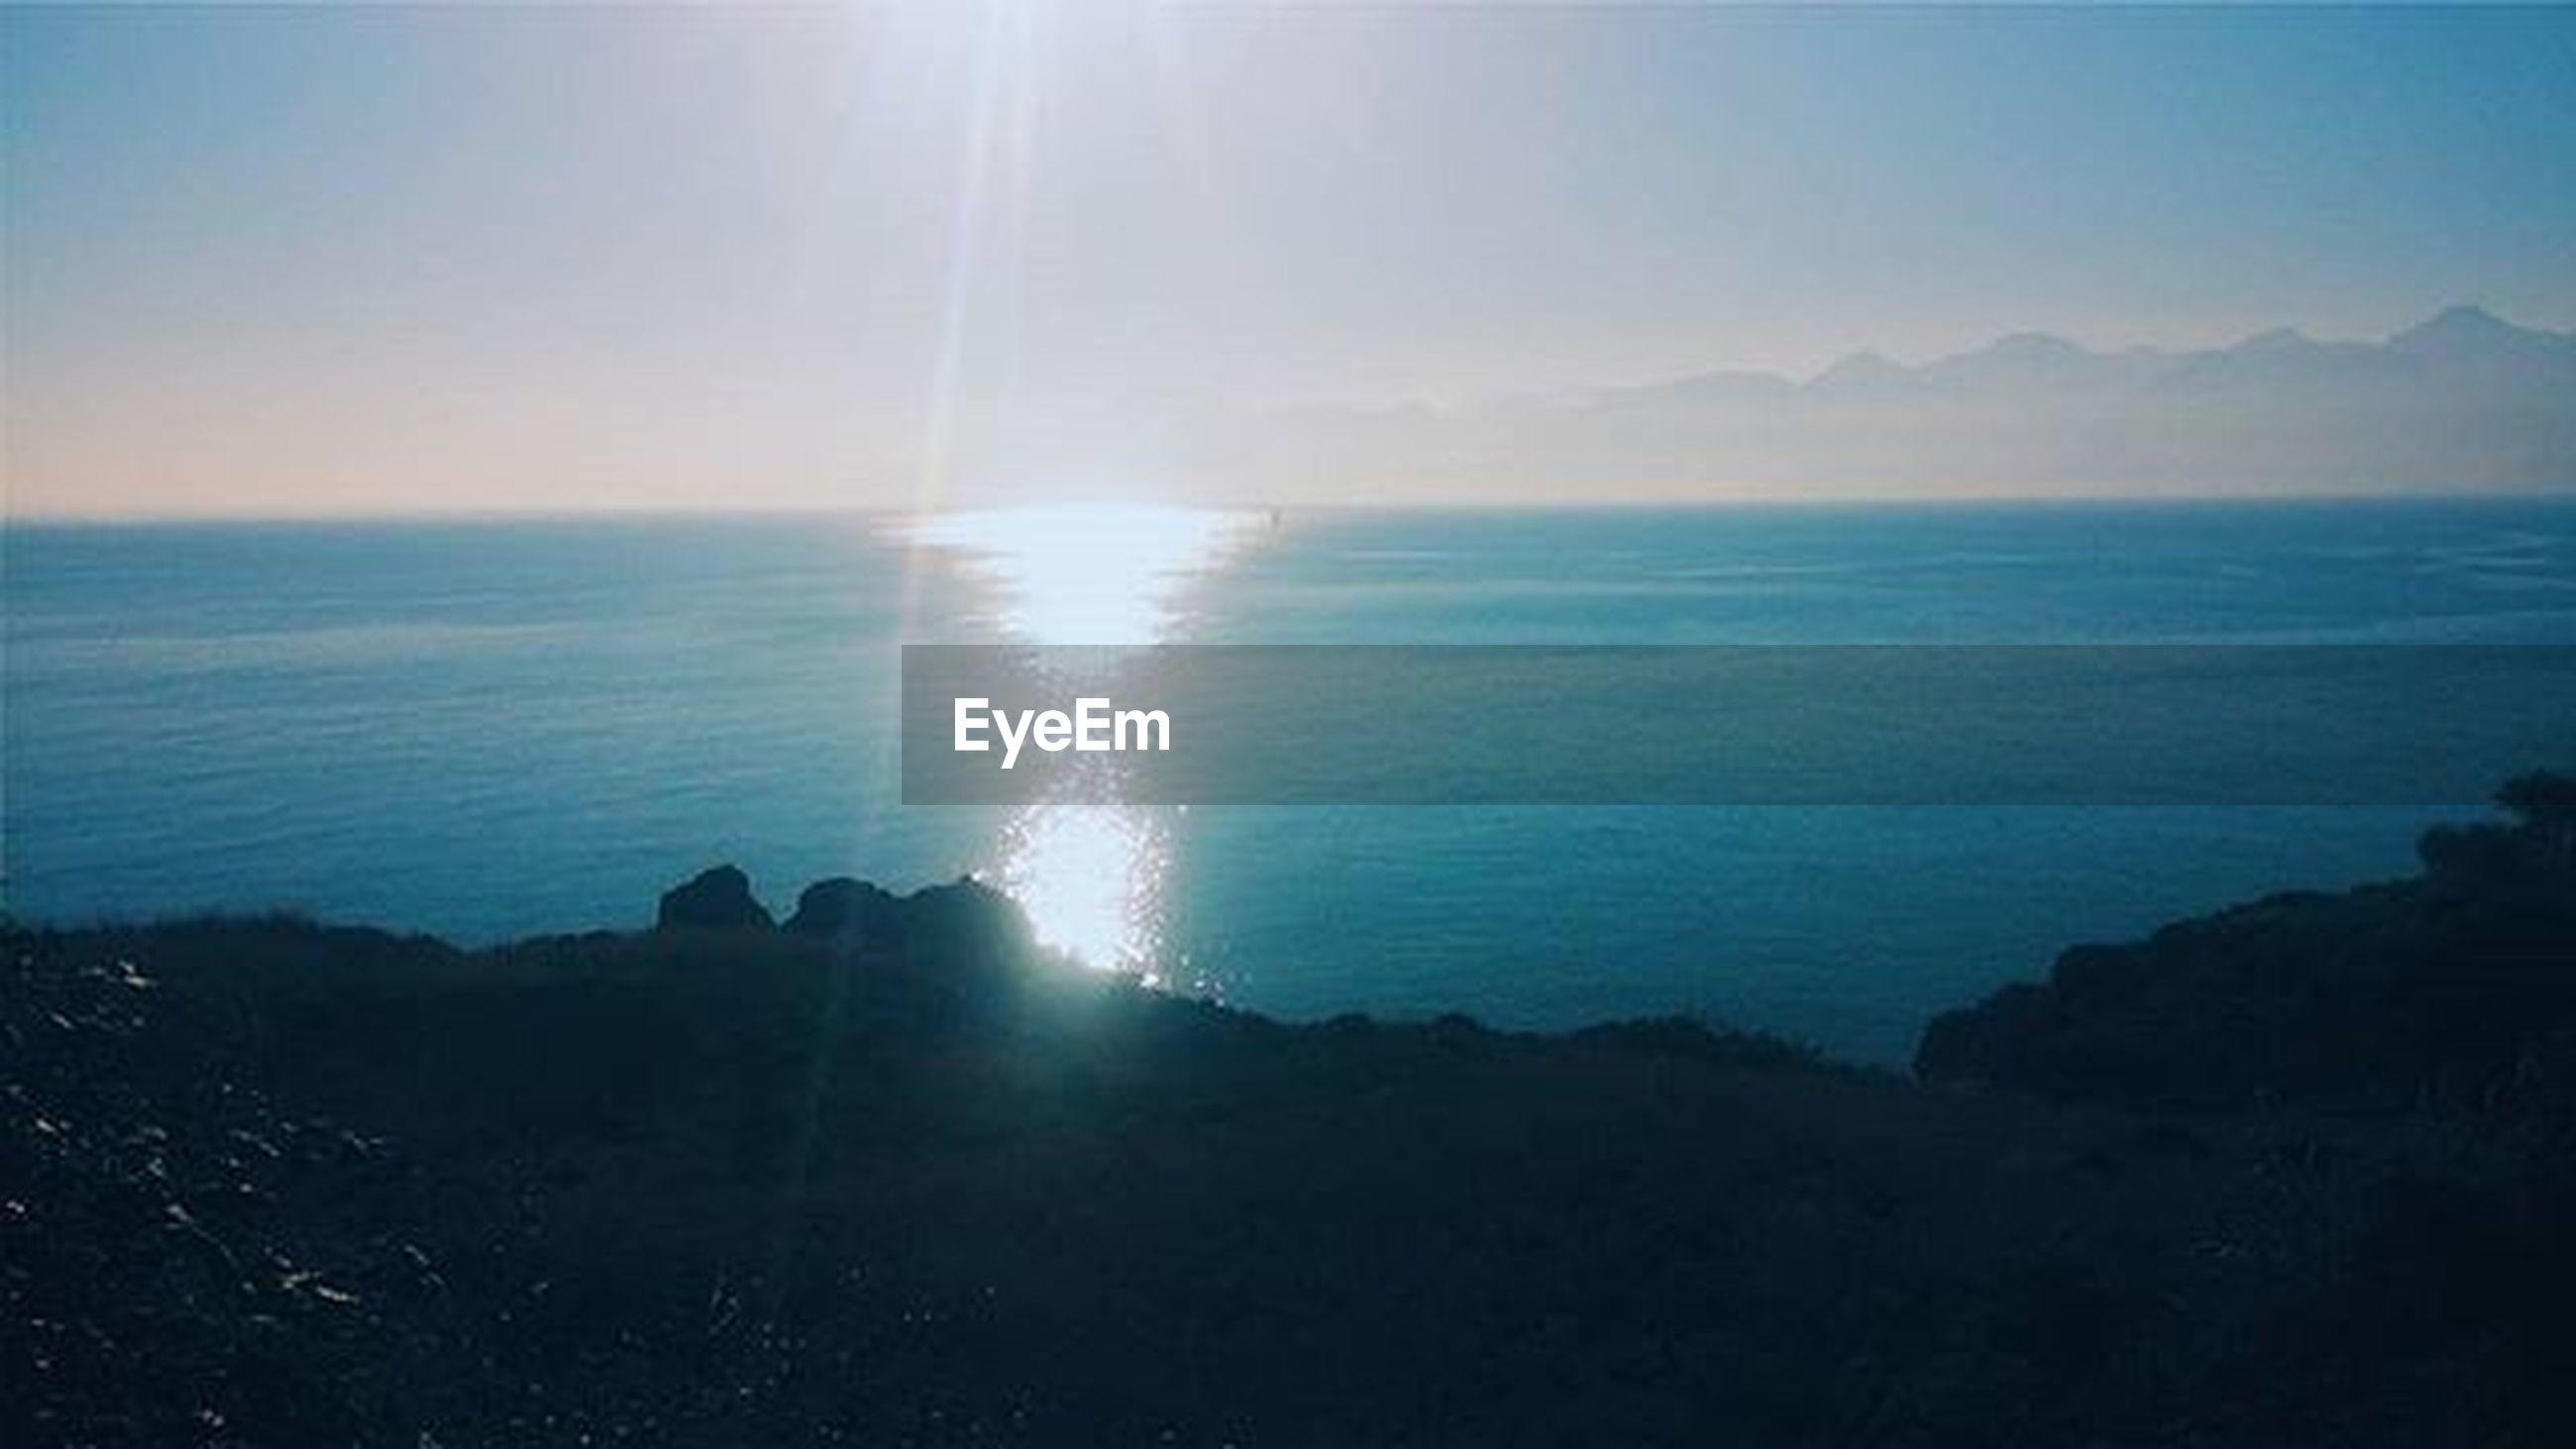 sea, horizon over water, sun, water, tranquil scene, scenics, tranquility, beauty in nature, sunbeam, sunlight, lens flare, sky, nature, idyllic, blue, reflection, beach, sunny, shore, clear sky